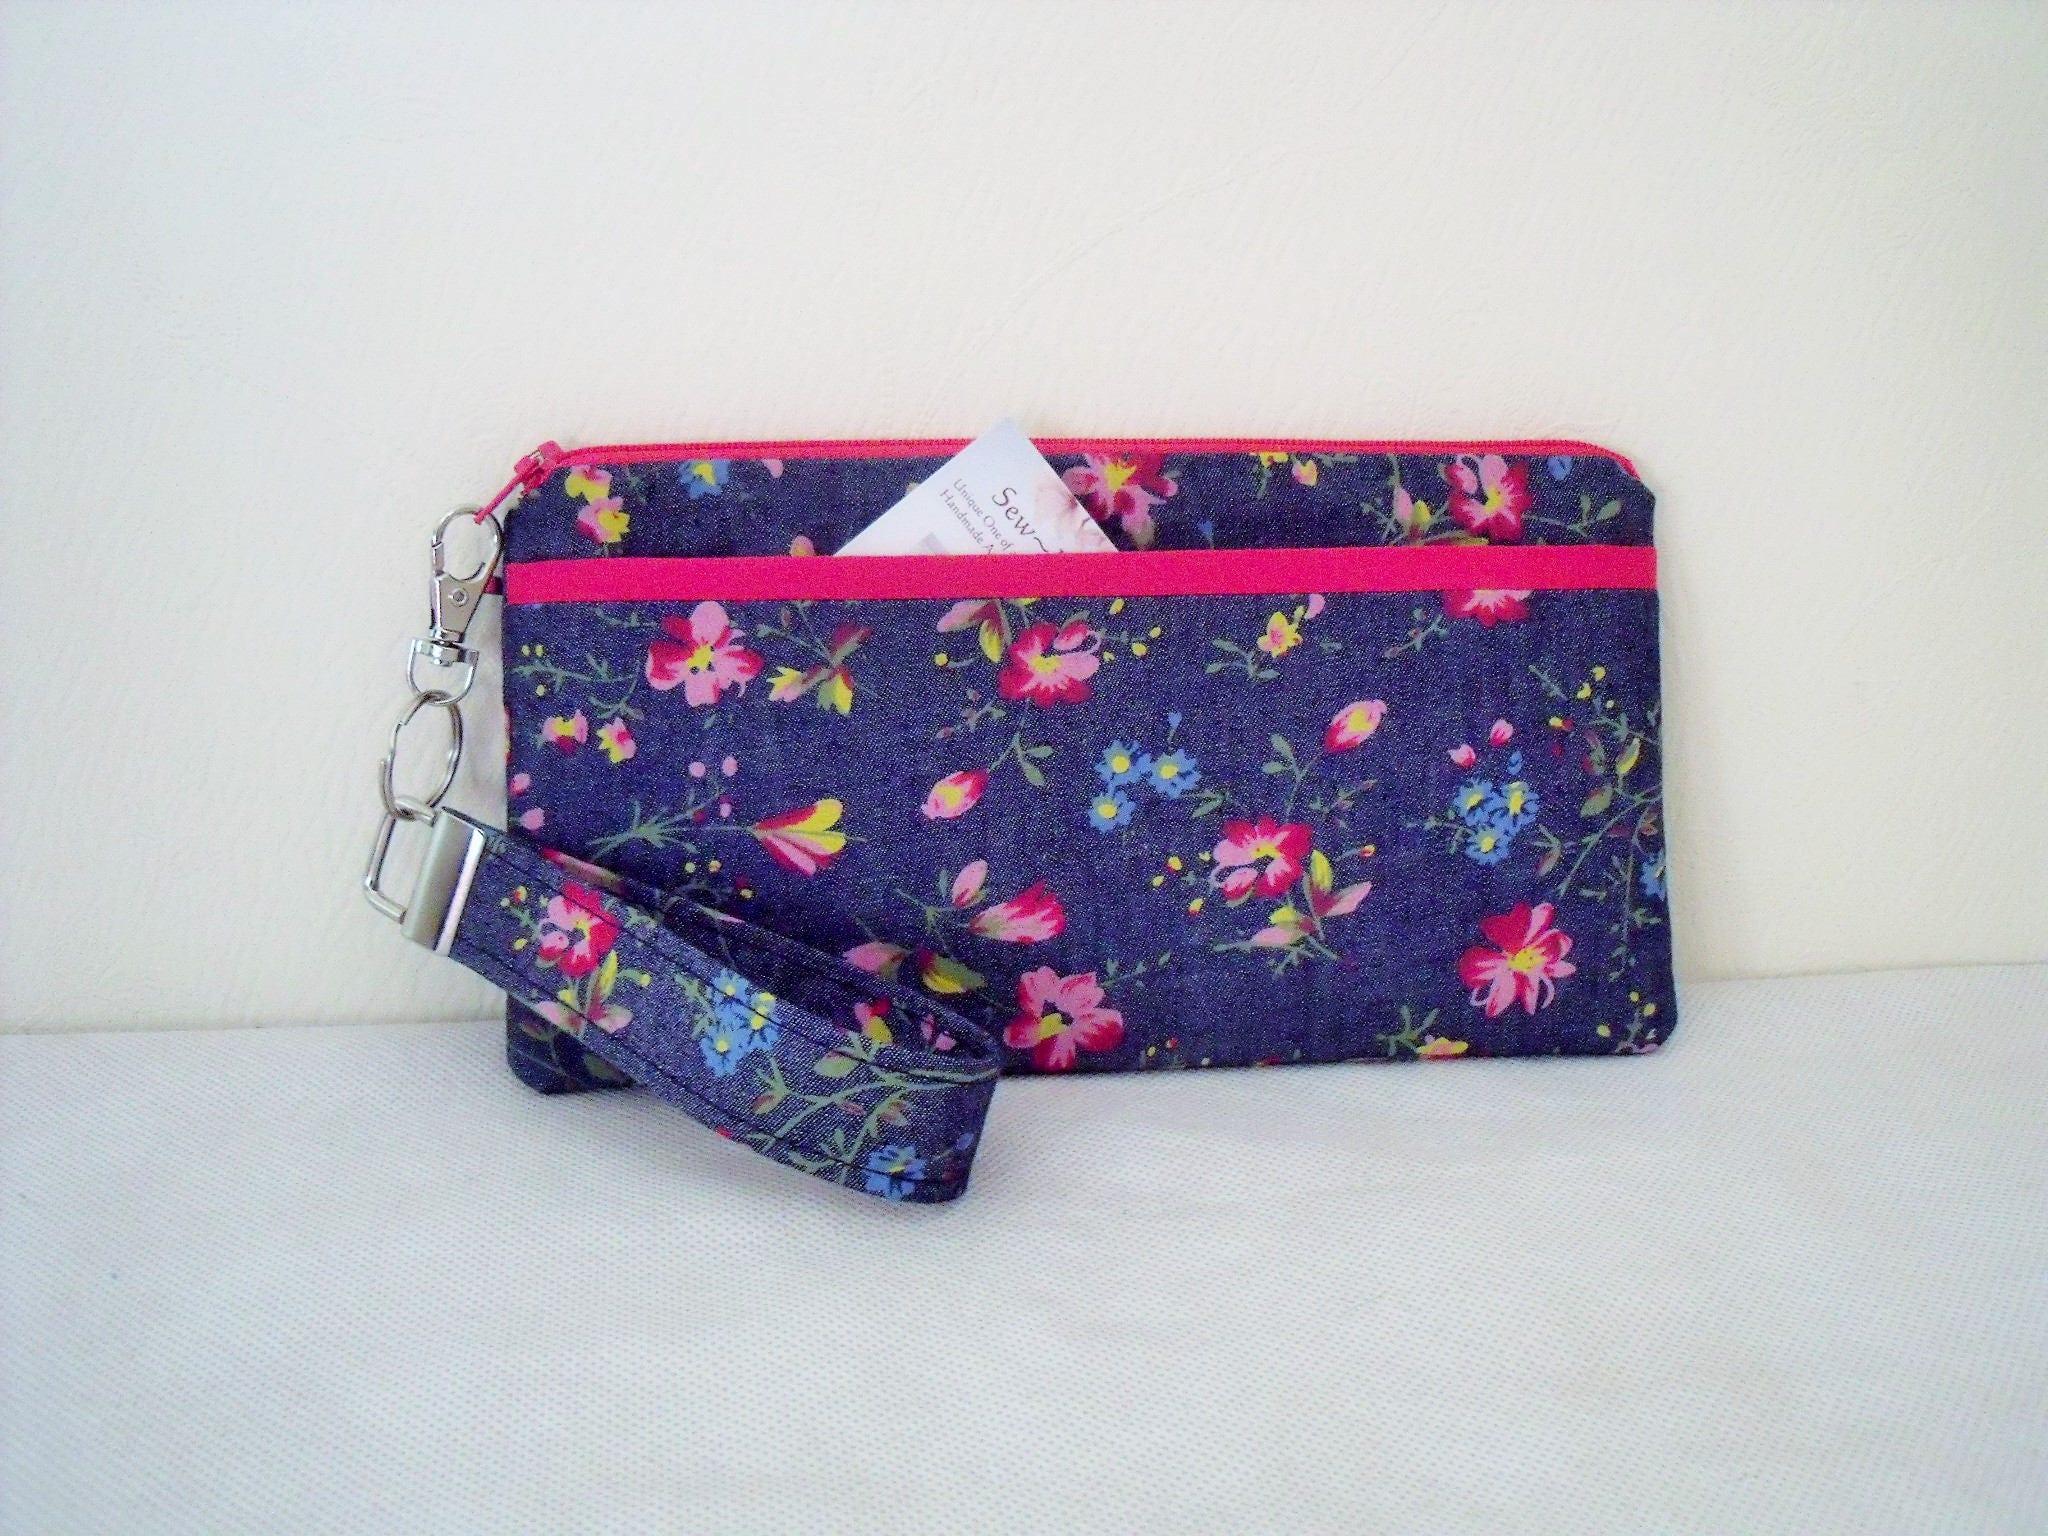 Floral chambray denim clutch  Purse  Wristlet Wallet evening Bag wrist strap key fob blue pink handmade